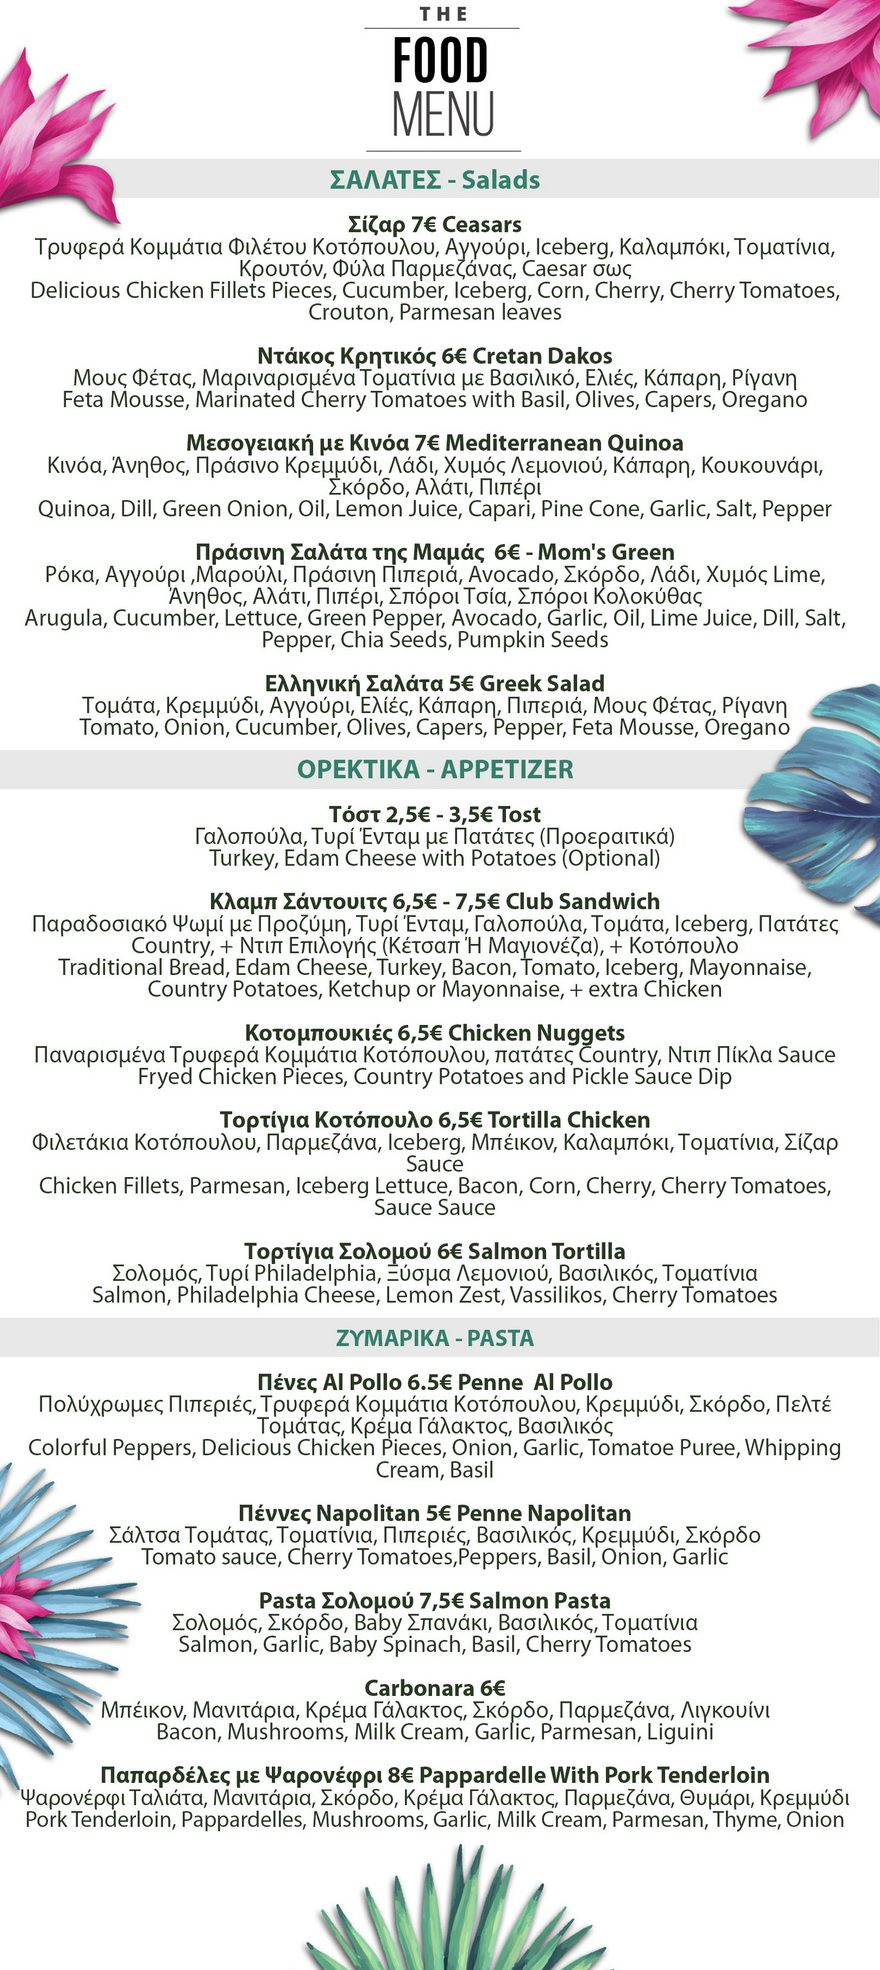 www.omikron2athens.gr Food-menu-1d